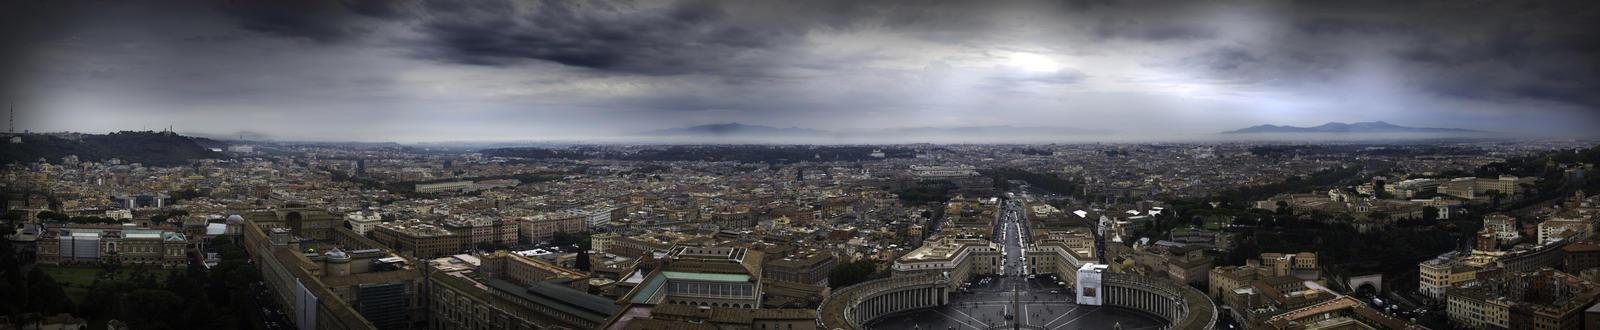 rome panorama by eiddesign